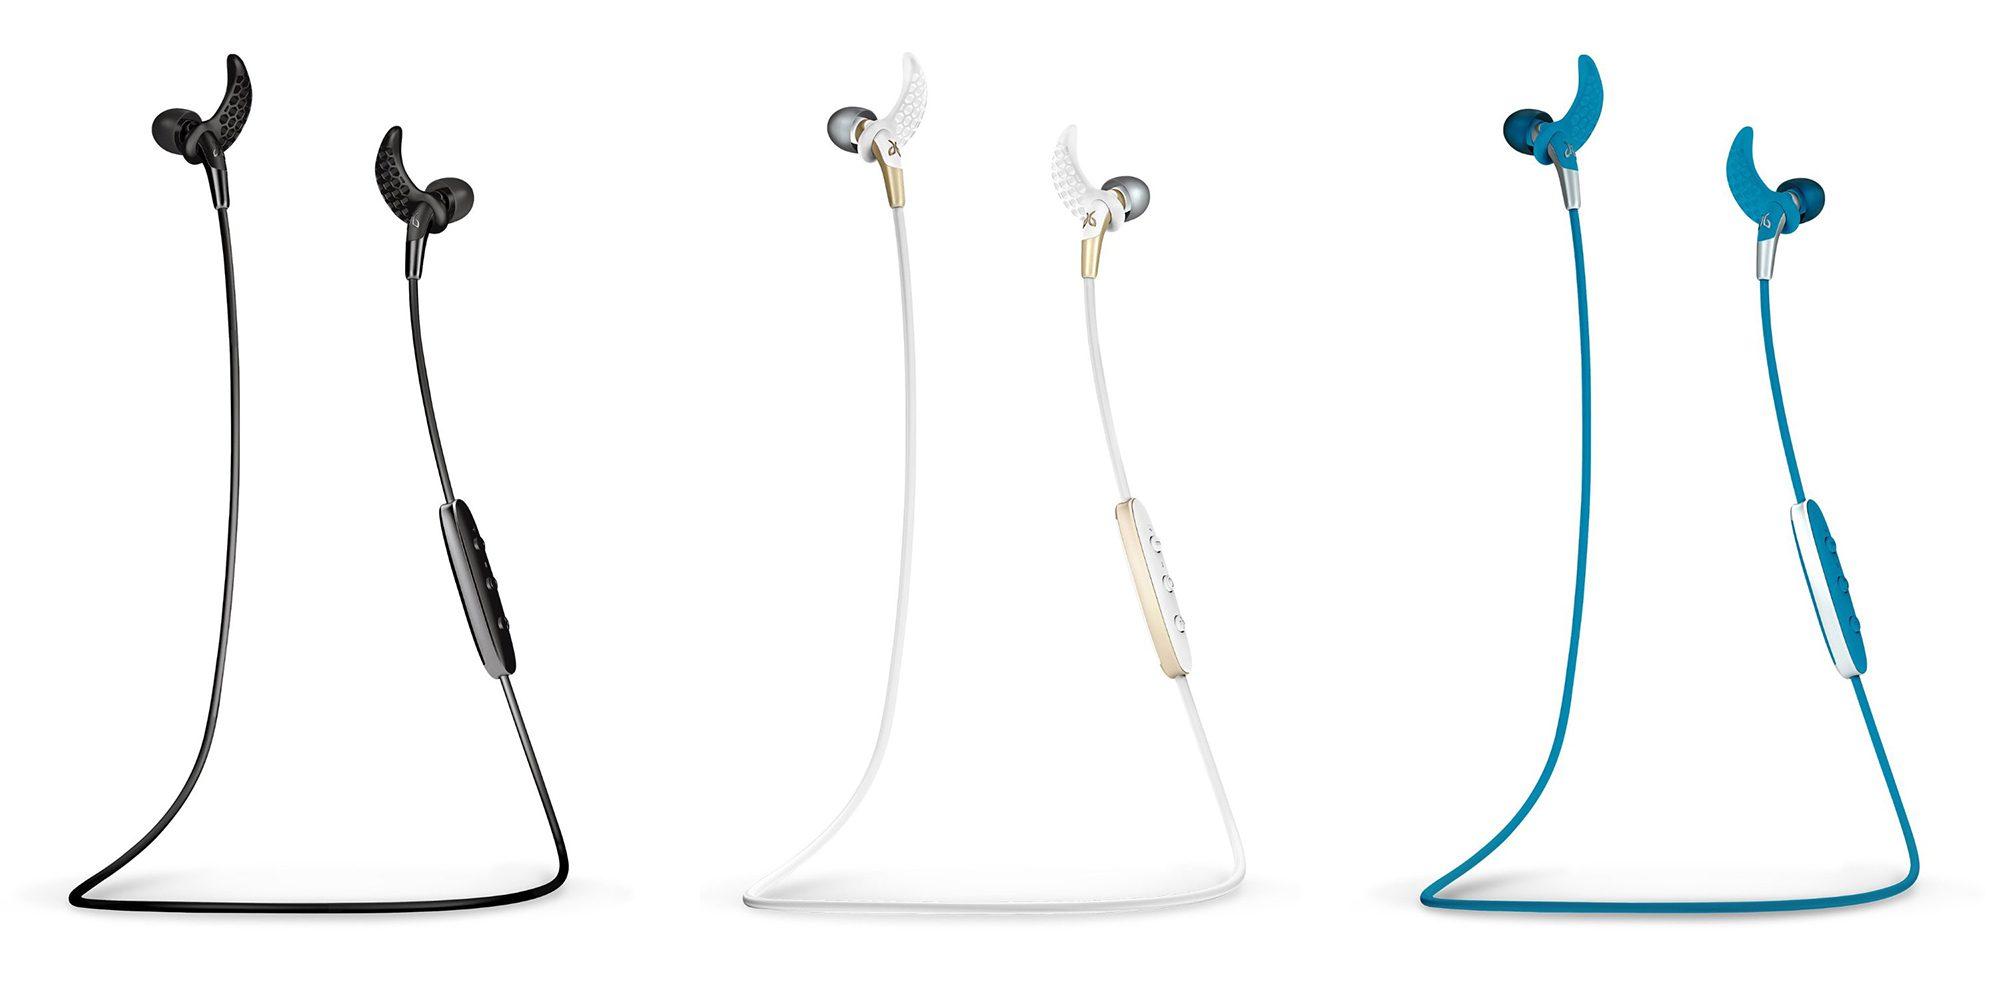 jaybird-freedom-f5-headphones